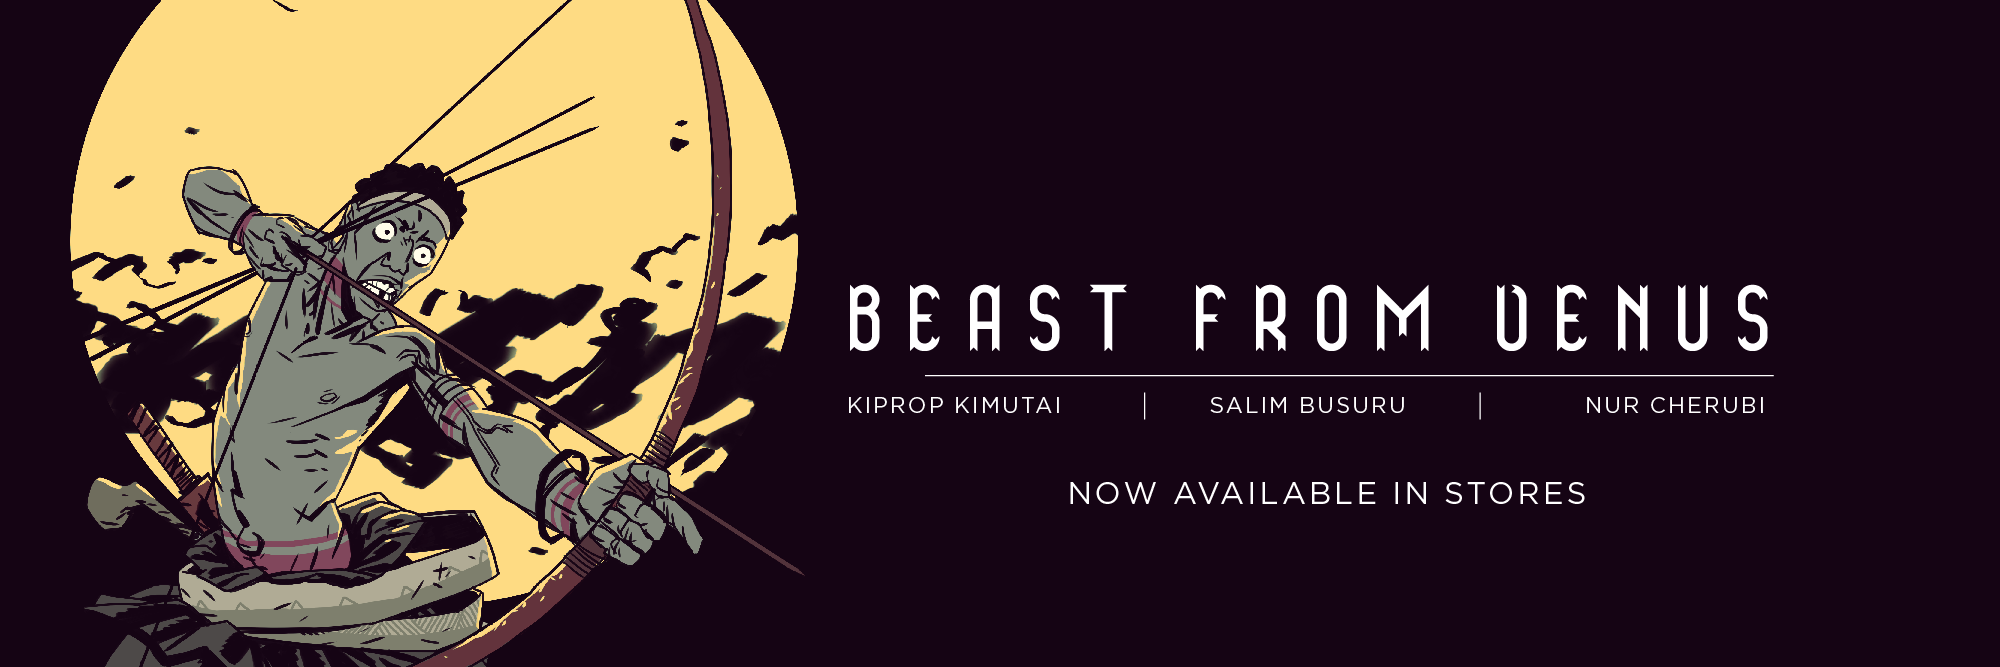 Beast from Venus social media cover photo